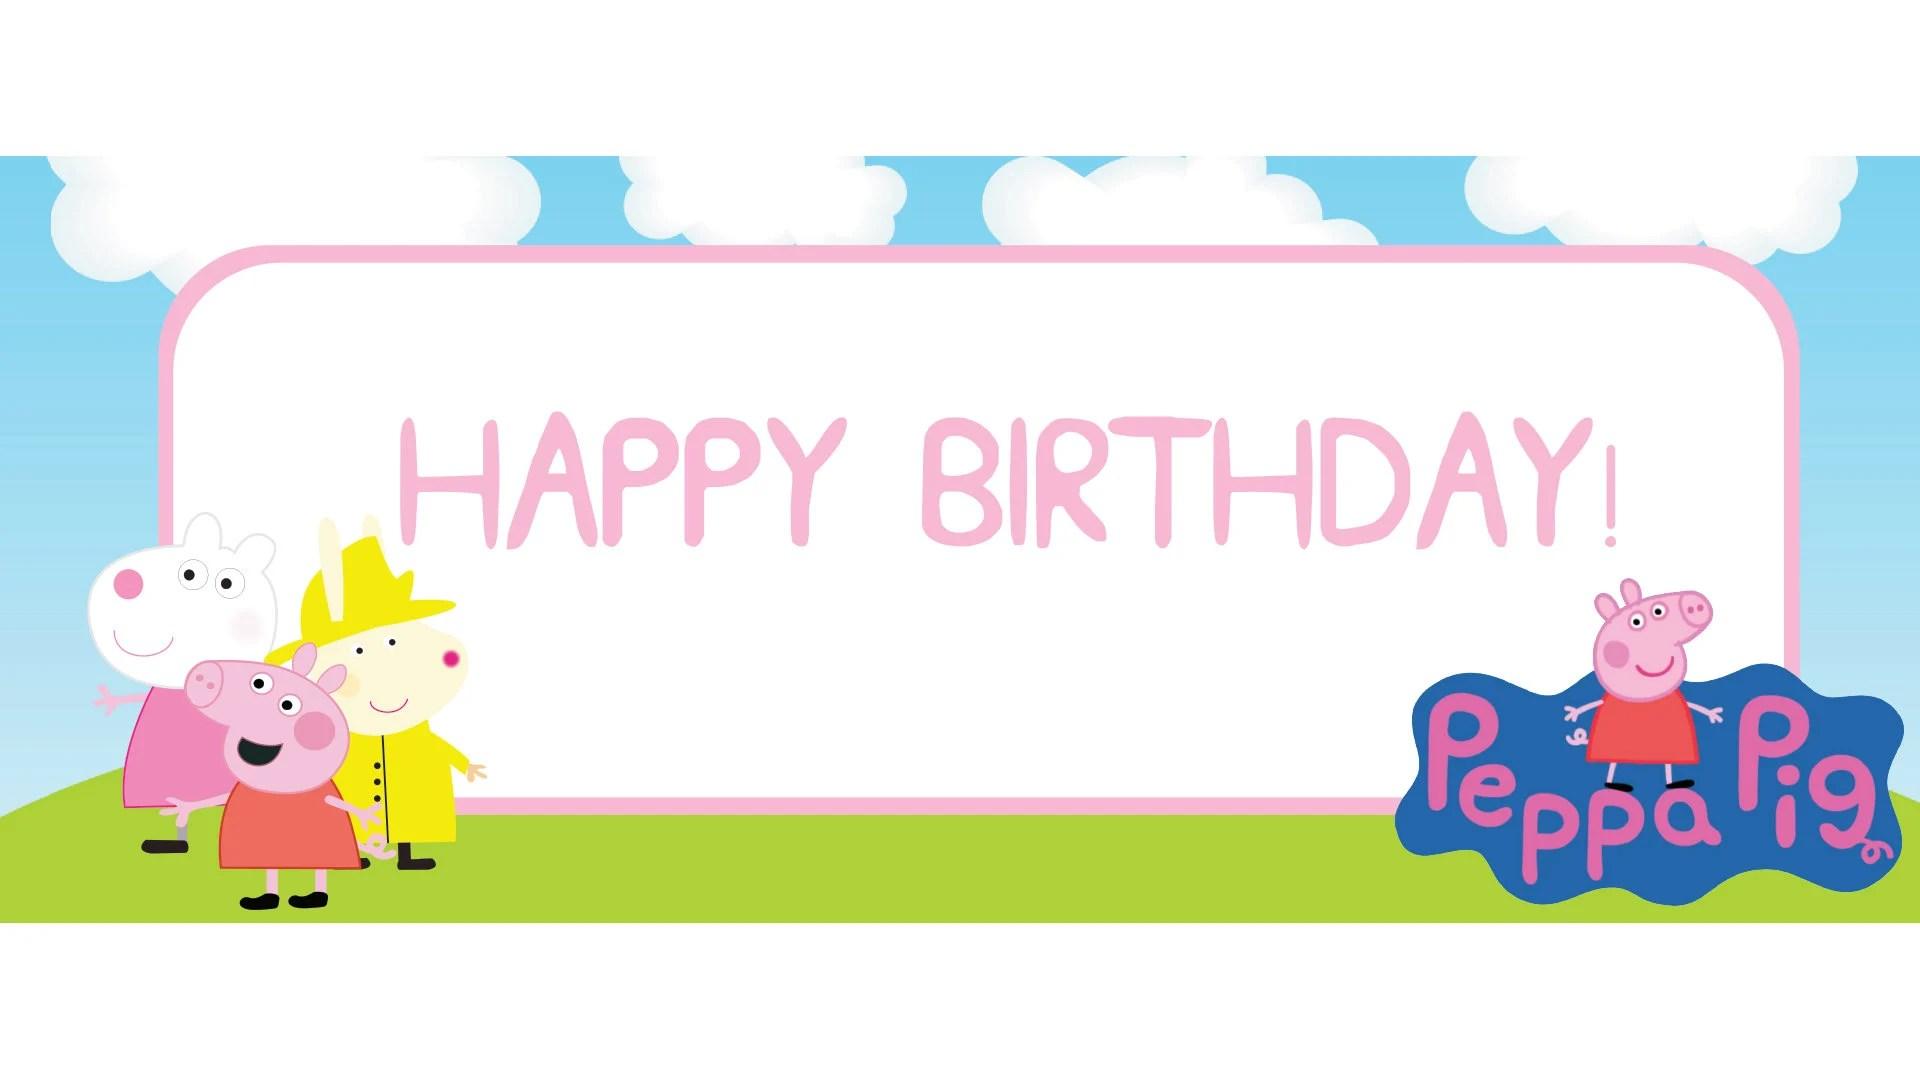 Peppa Pig Happy Birthday Banner Printable Peppa Pig Party Etsy